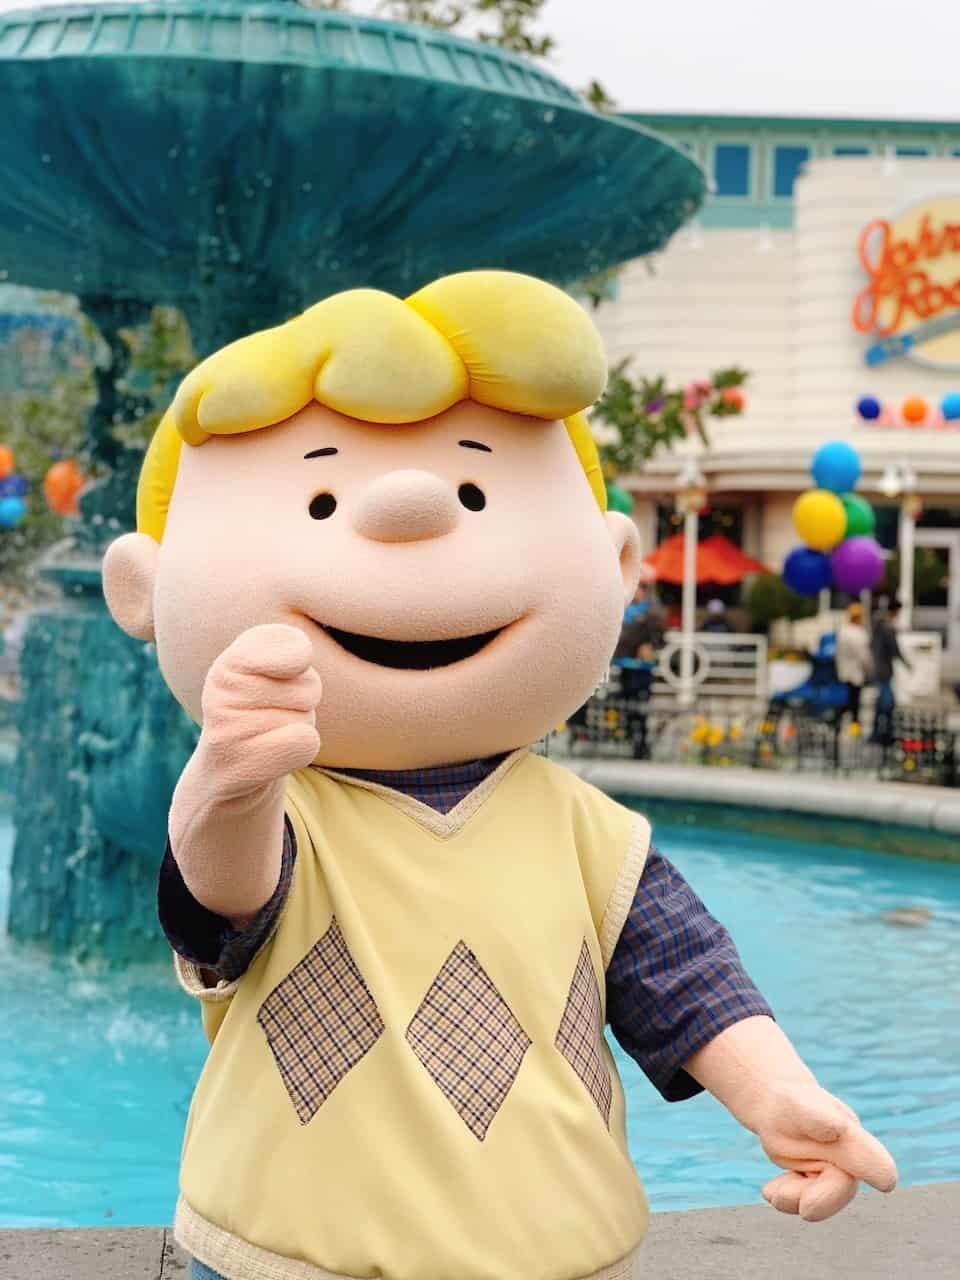 Knotts Peanuts Celebration in Buena Park